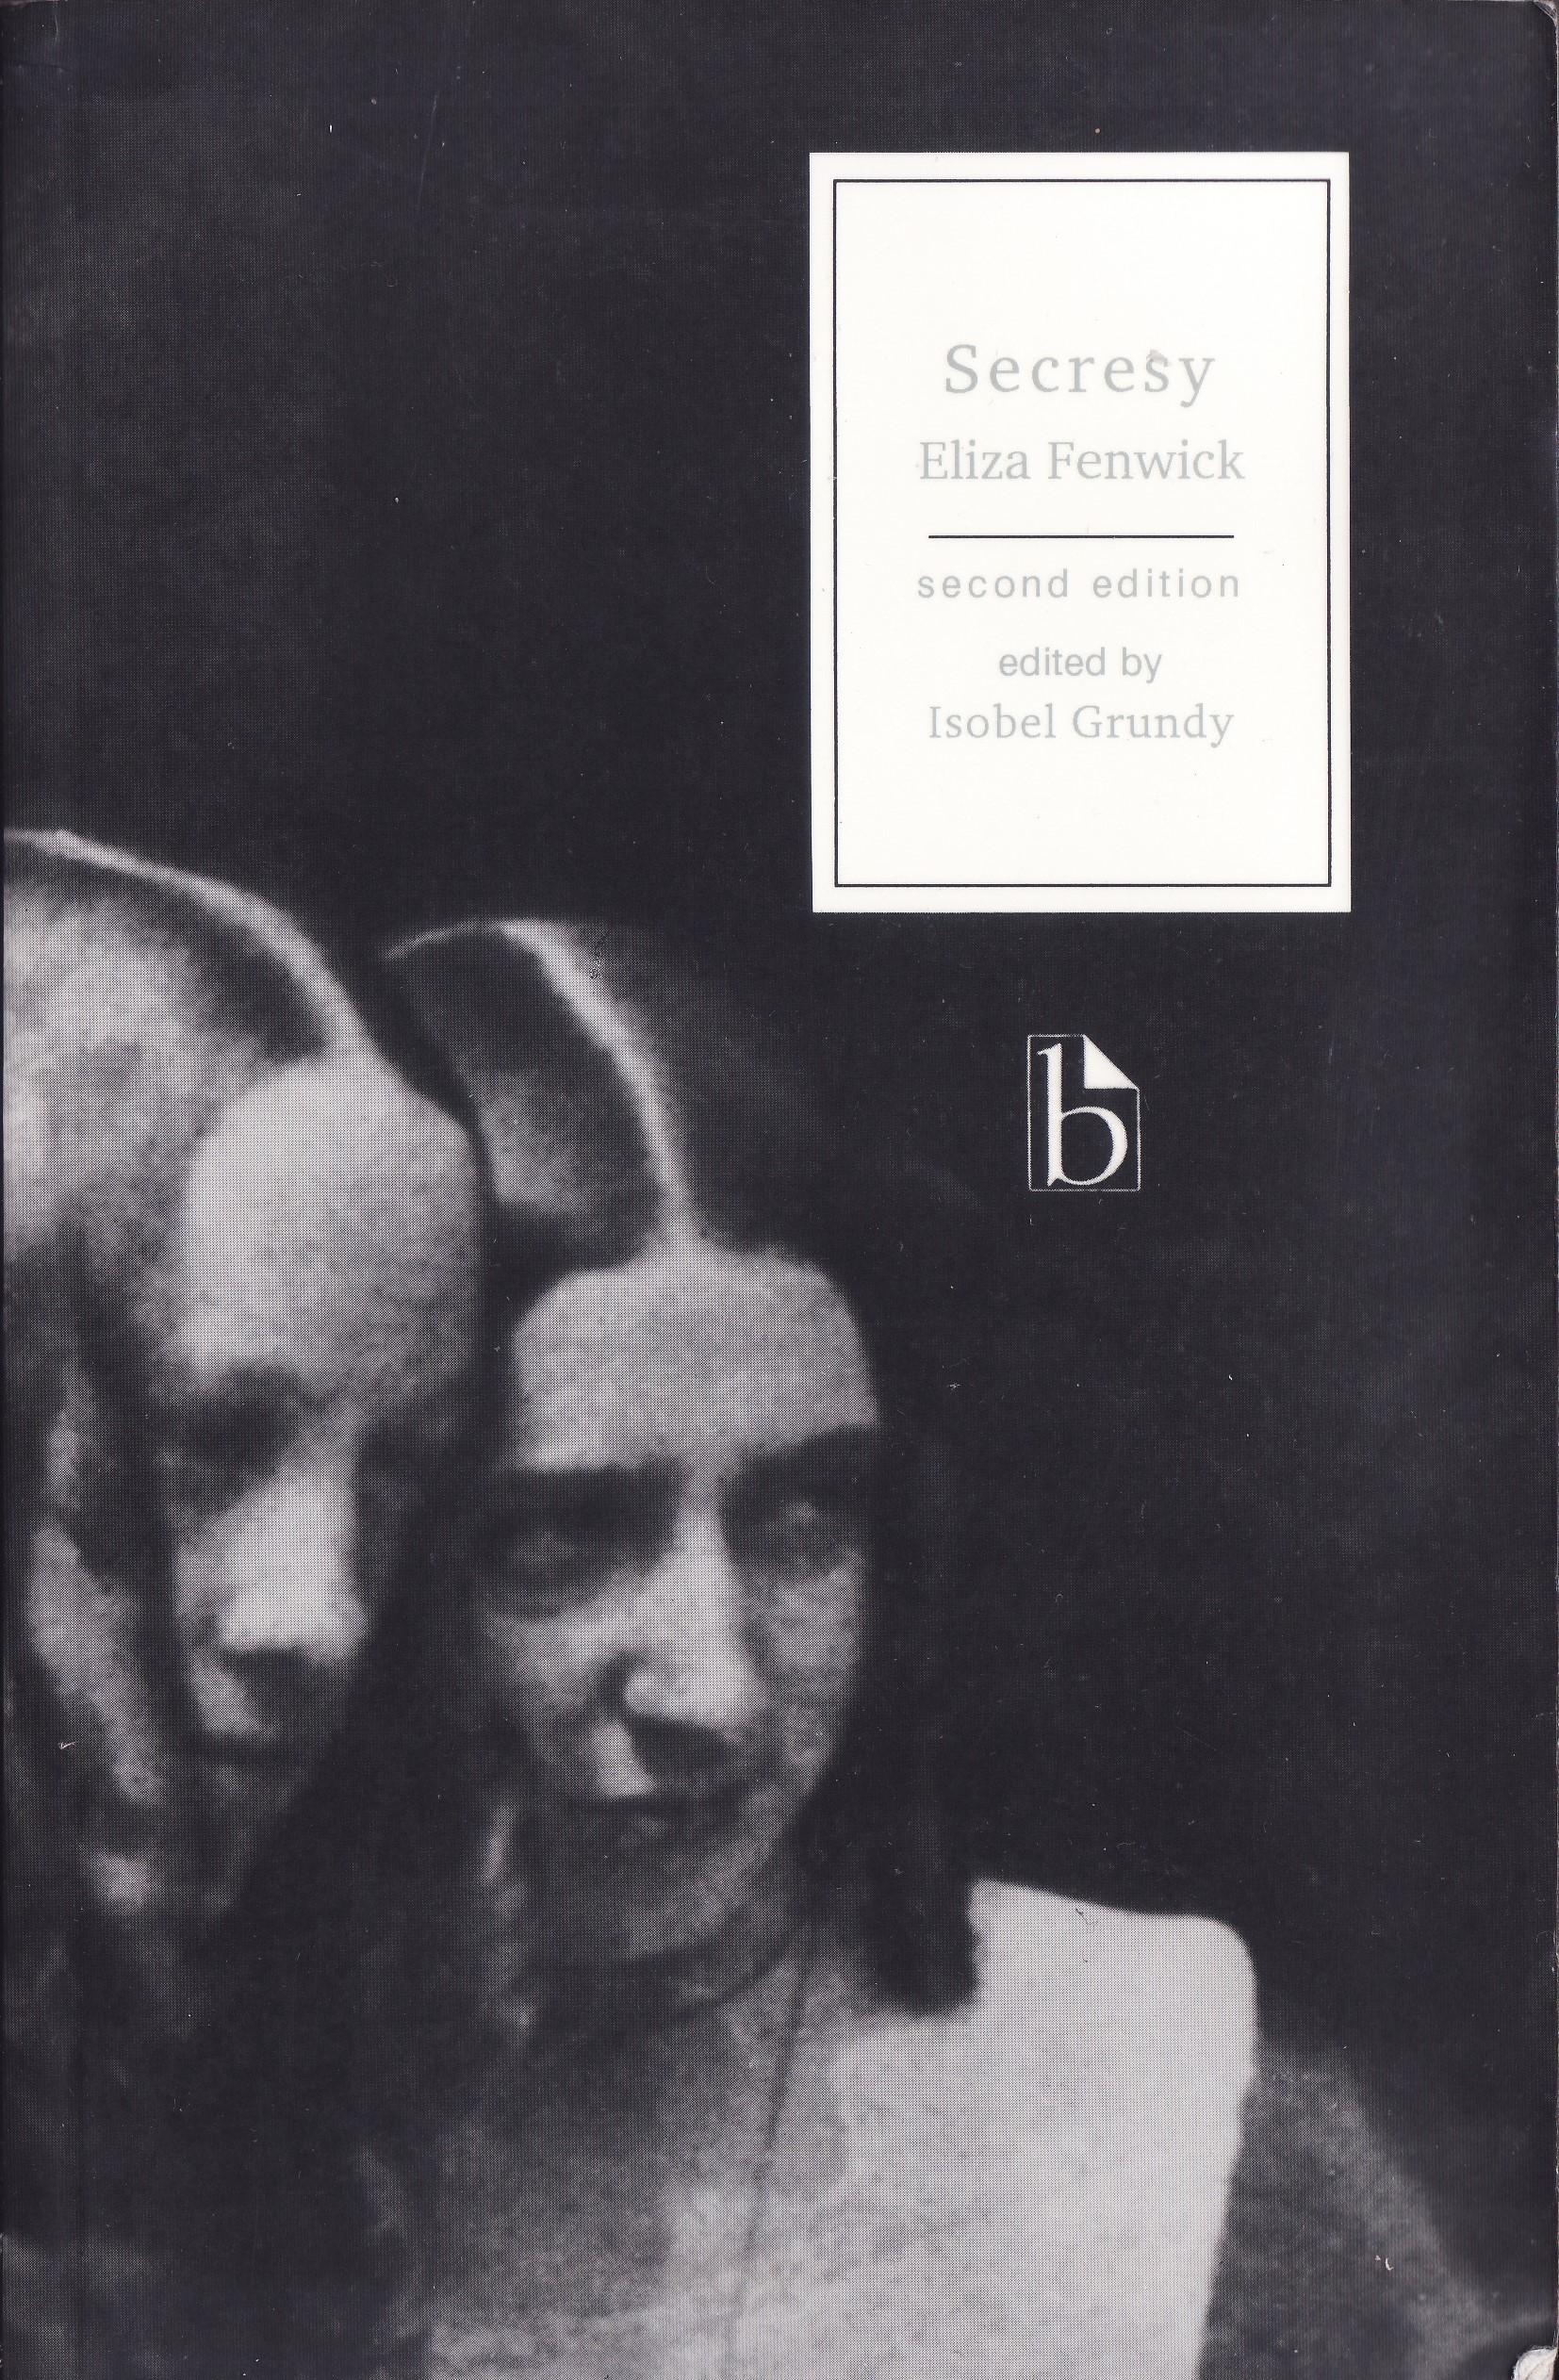 Secresy, second edition